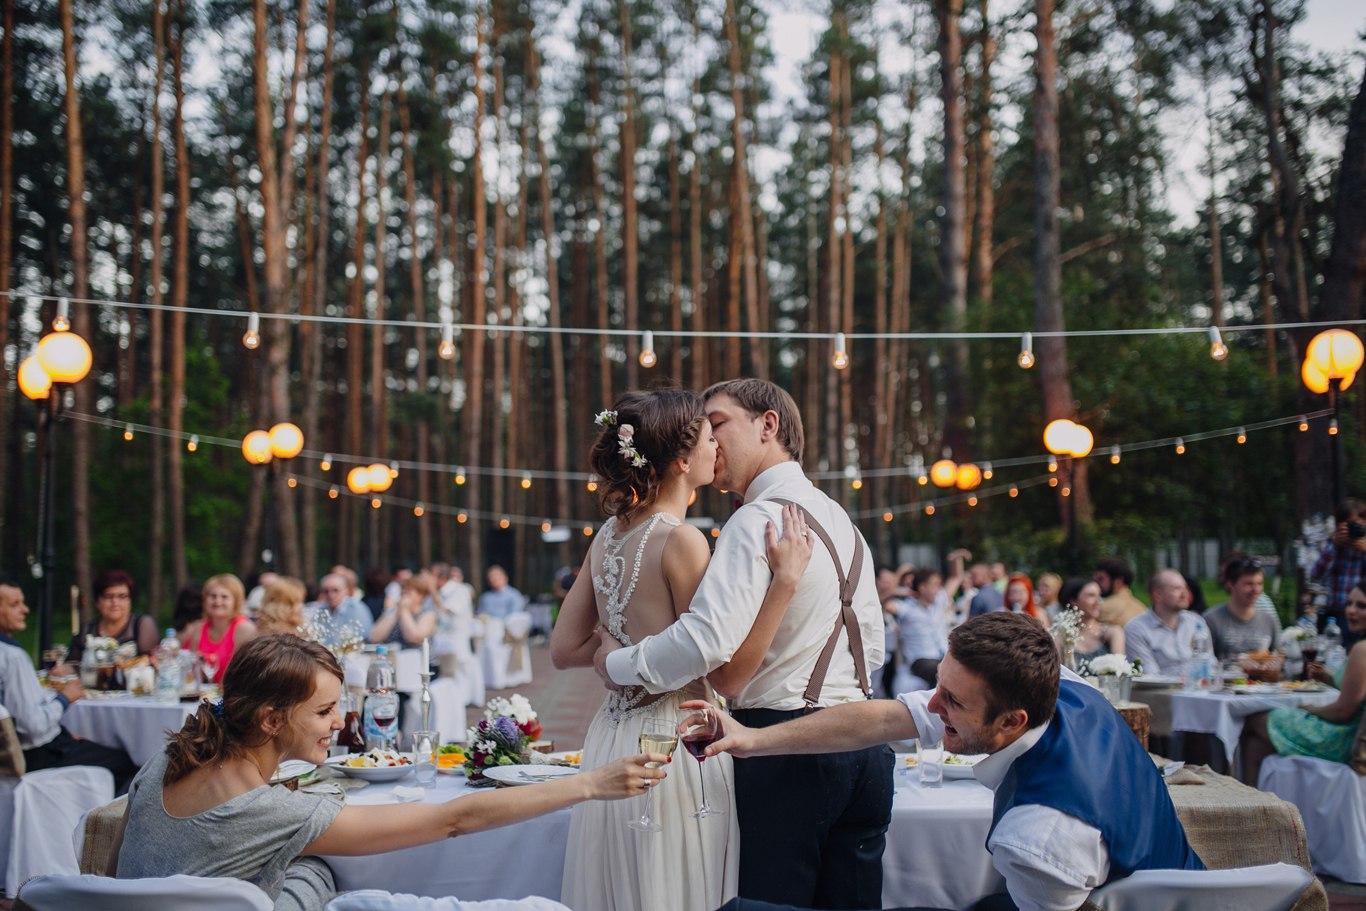 ZAqdVq7k q0 - Вы еще не выбрали свадебного фотографа?